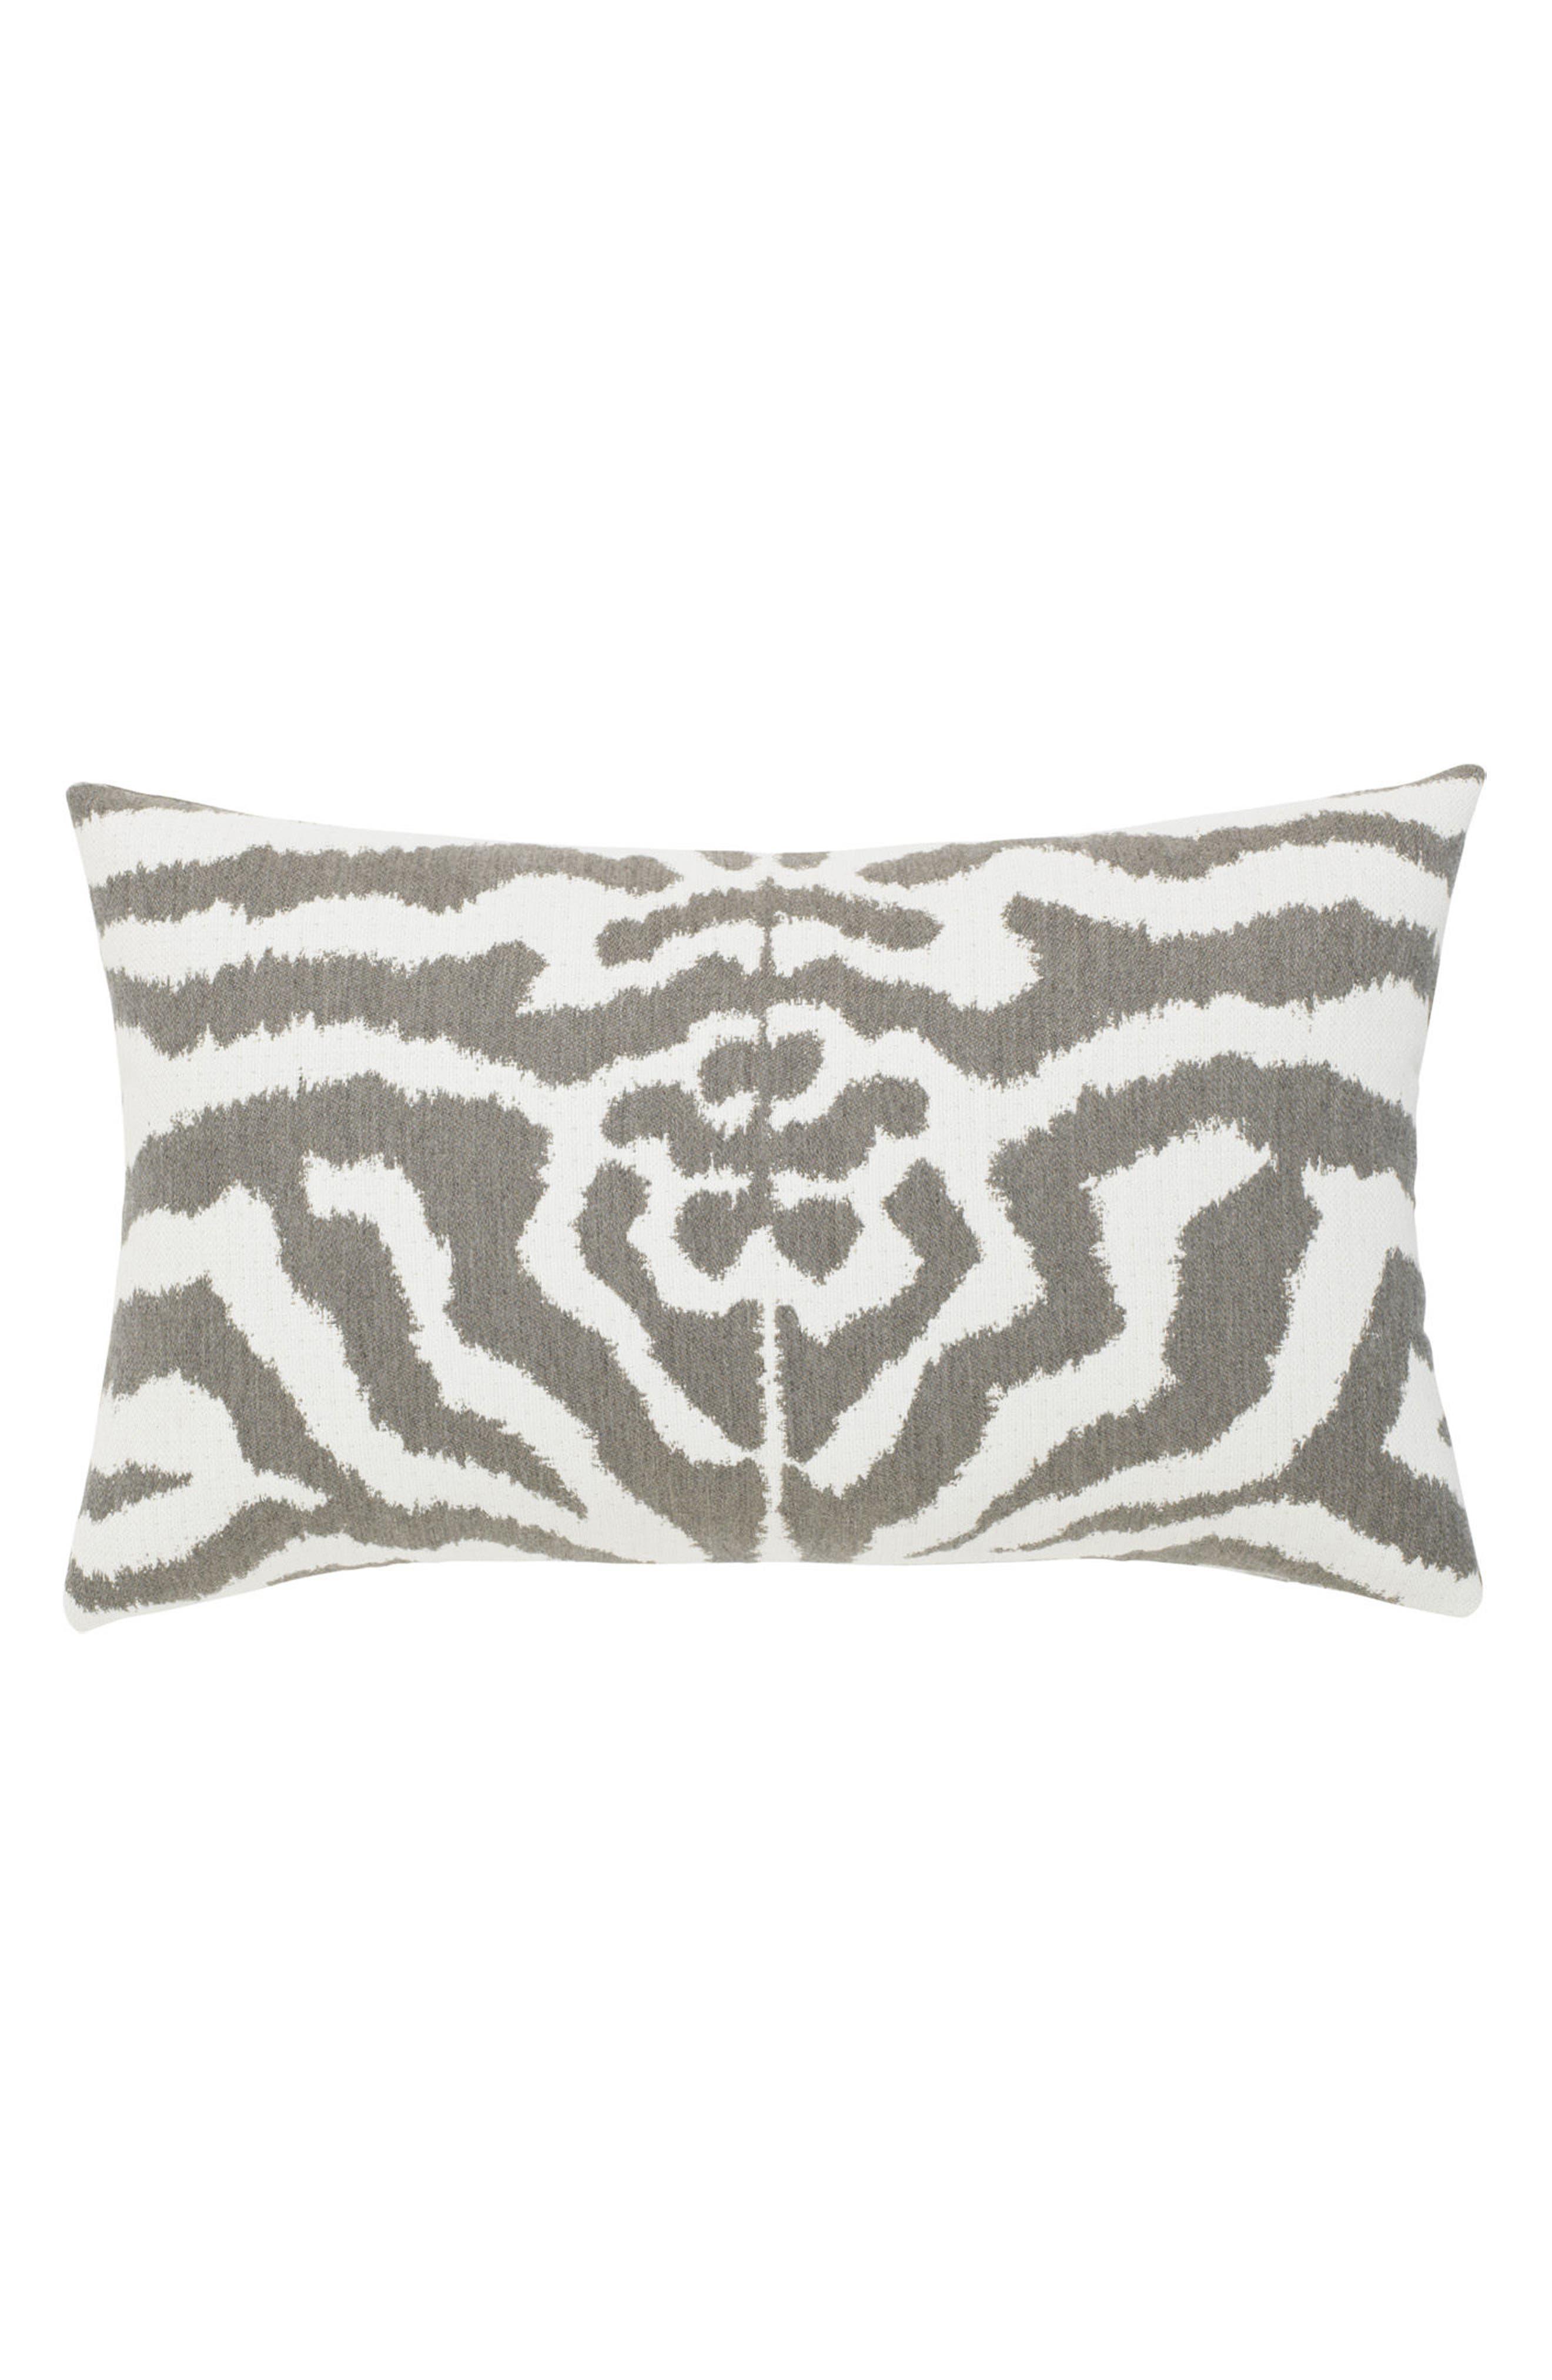 Alternate Image 3  - Elaine Smith Zebra Gray Indoor/Outdoor Accent Pillow